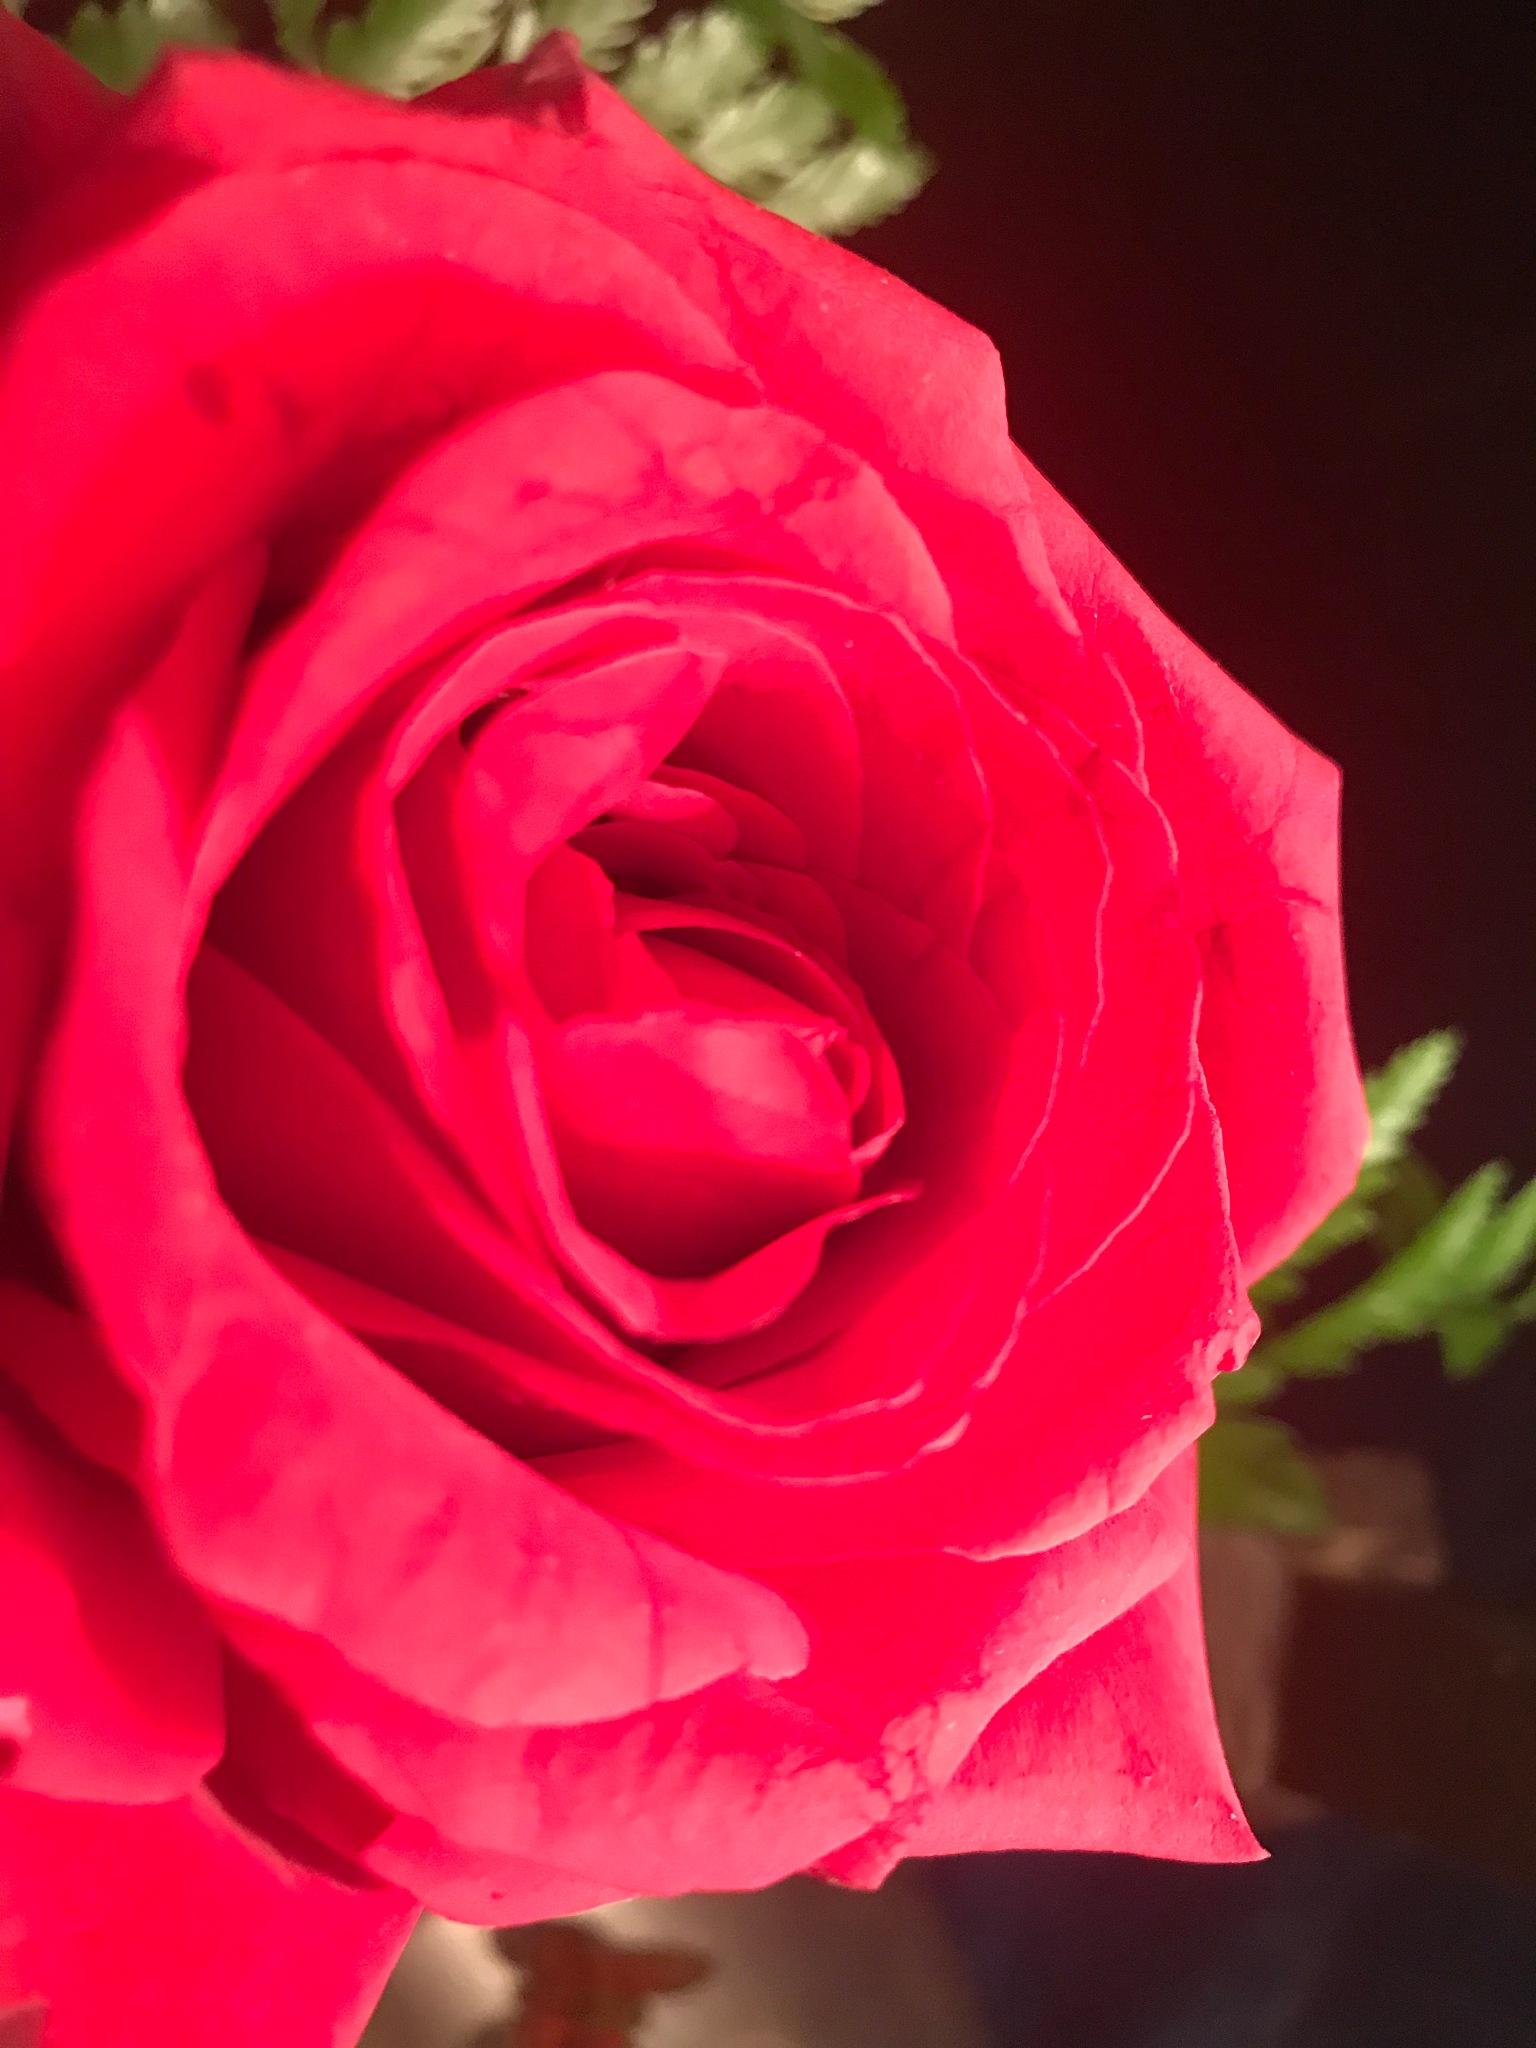 The Rose by Keri E. Carter